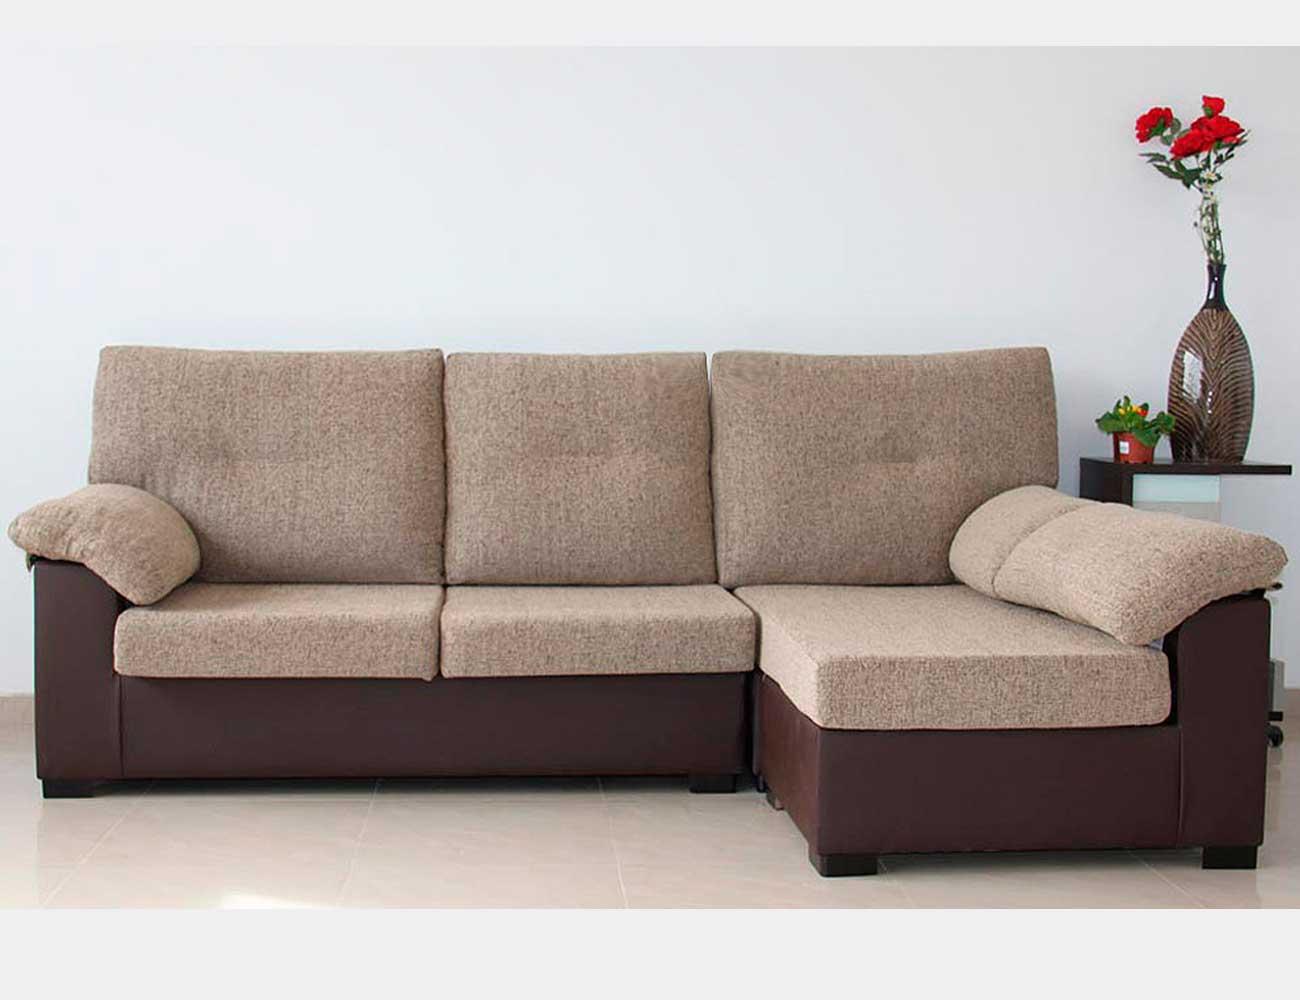 Sofa chaise longue barato